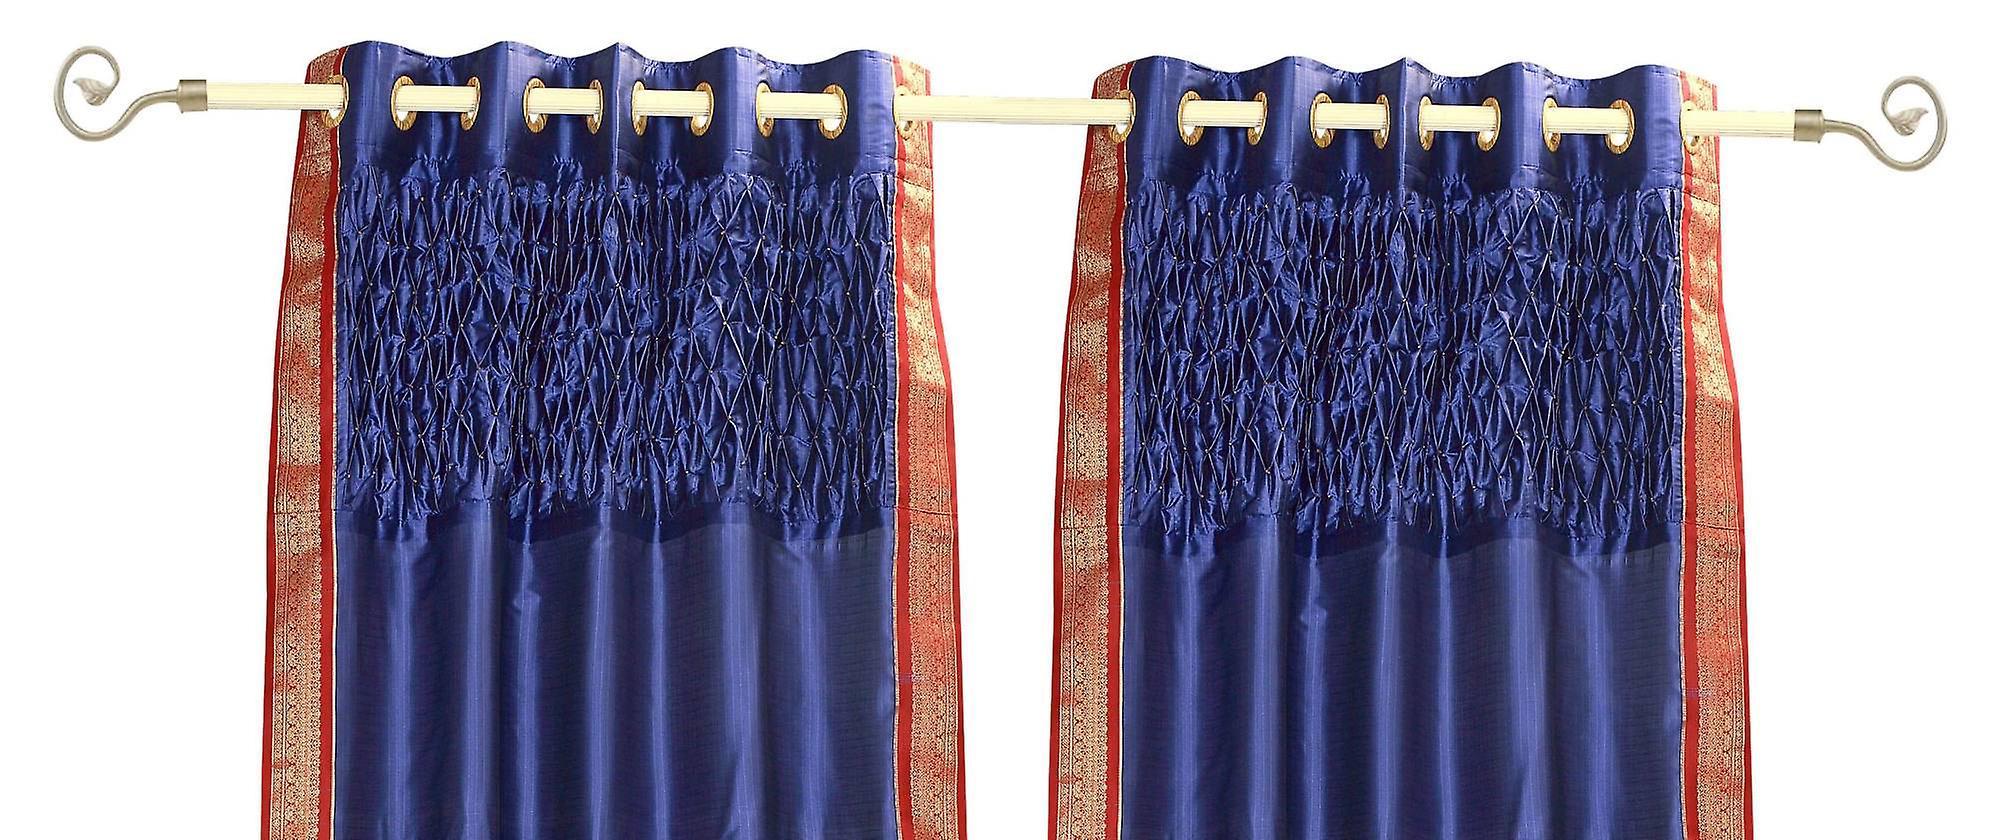 Sari Panneau Sheer Main Rideau Perlé Oeillet Bleu Supérieur Avec De DesignPièce I6vYmbfy7g